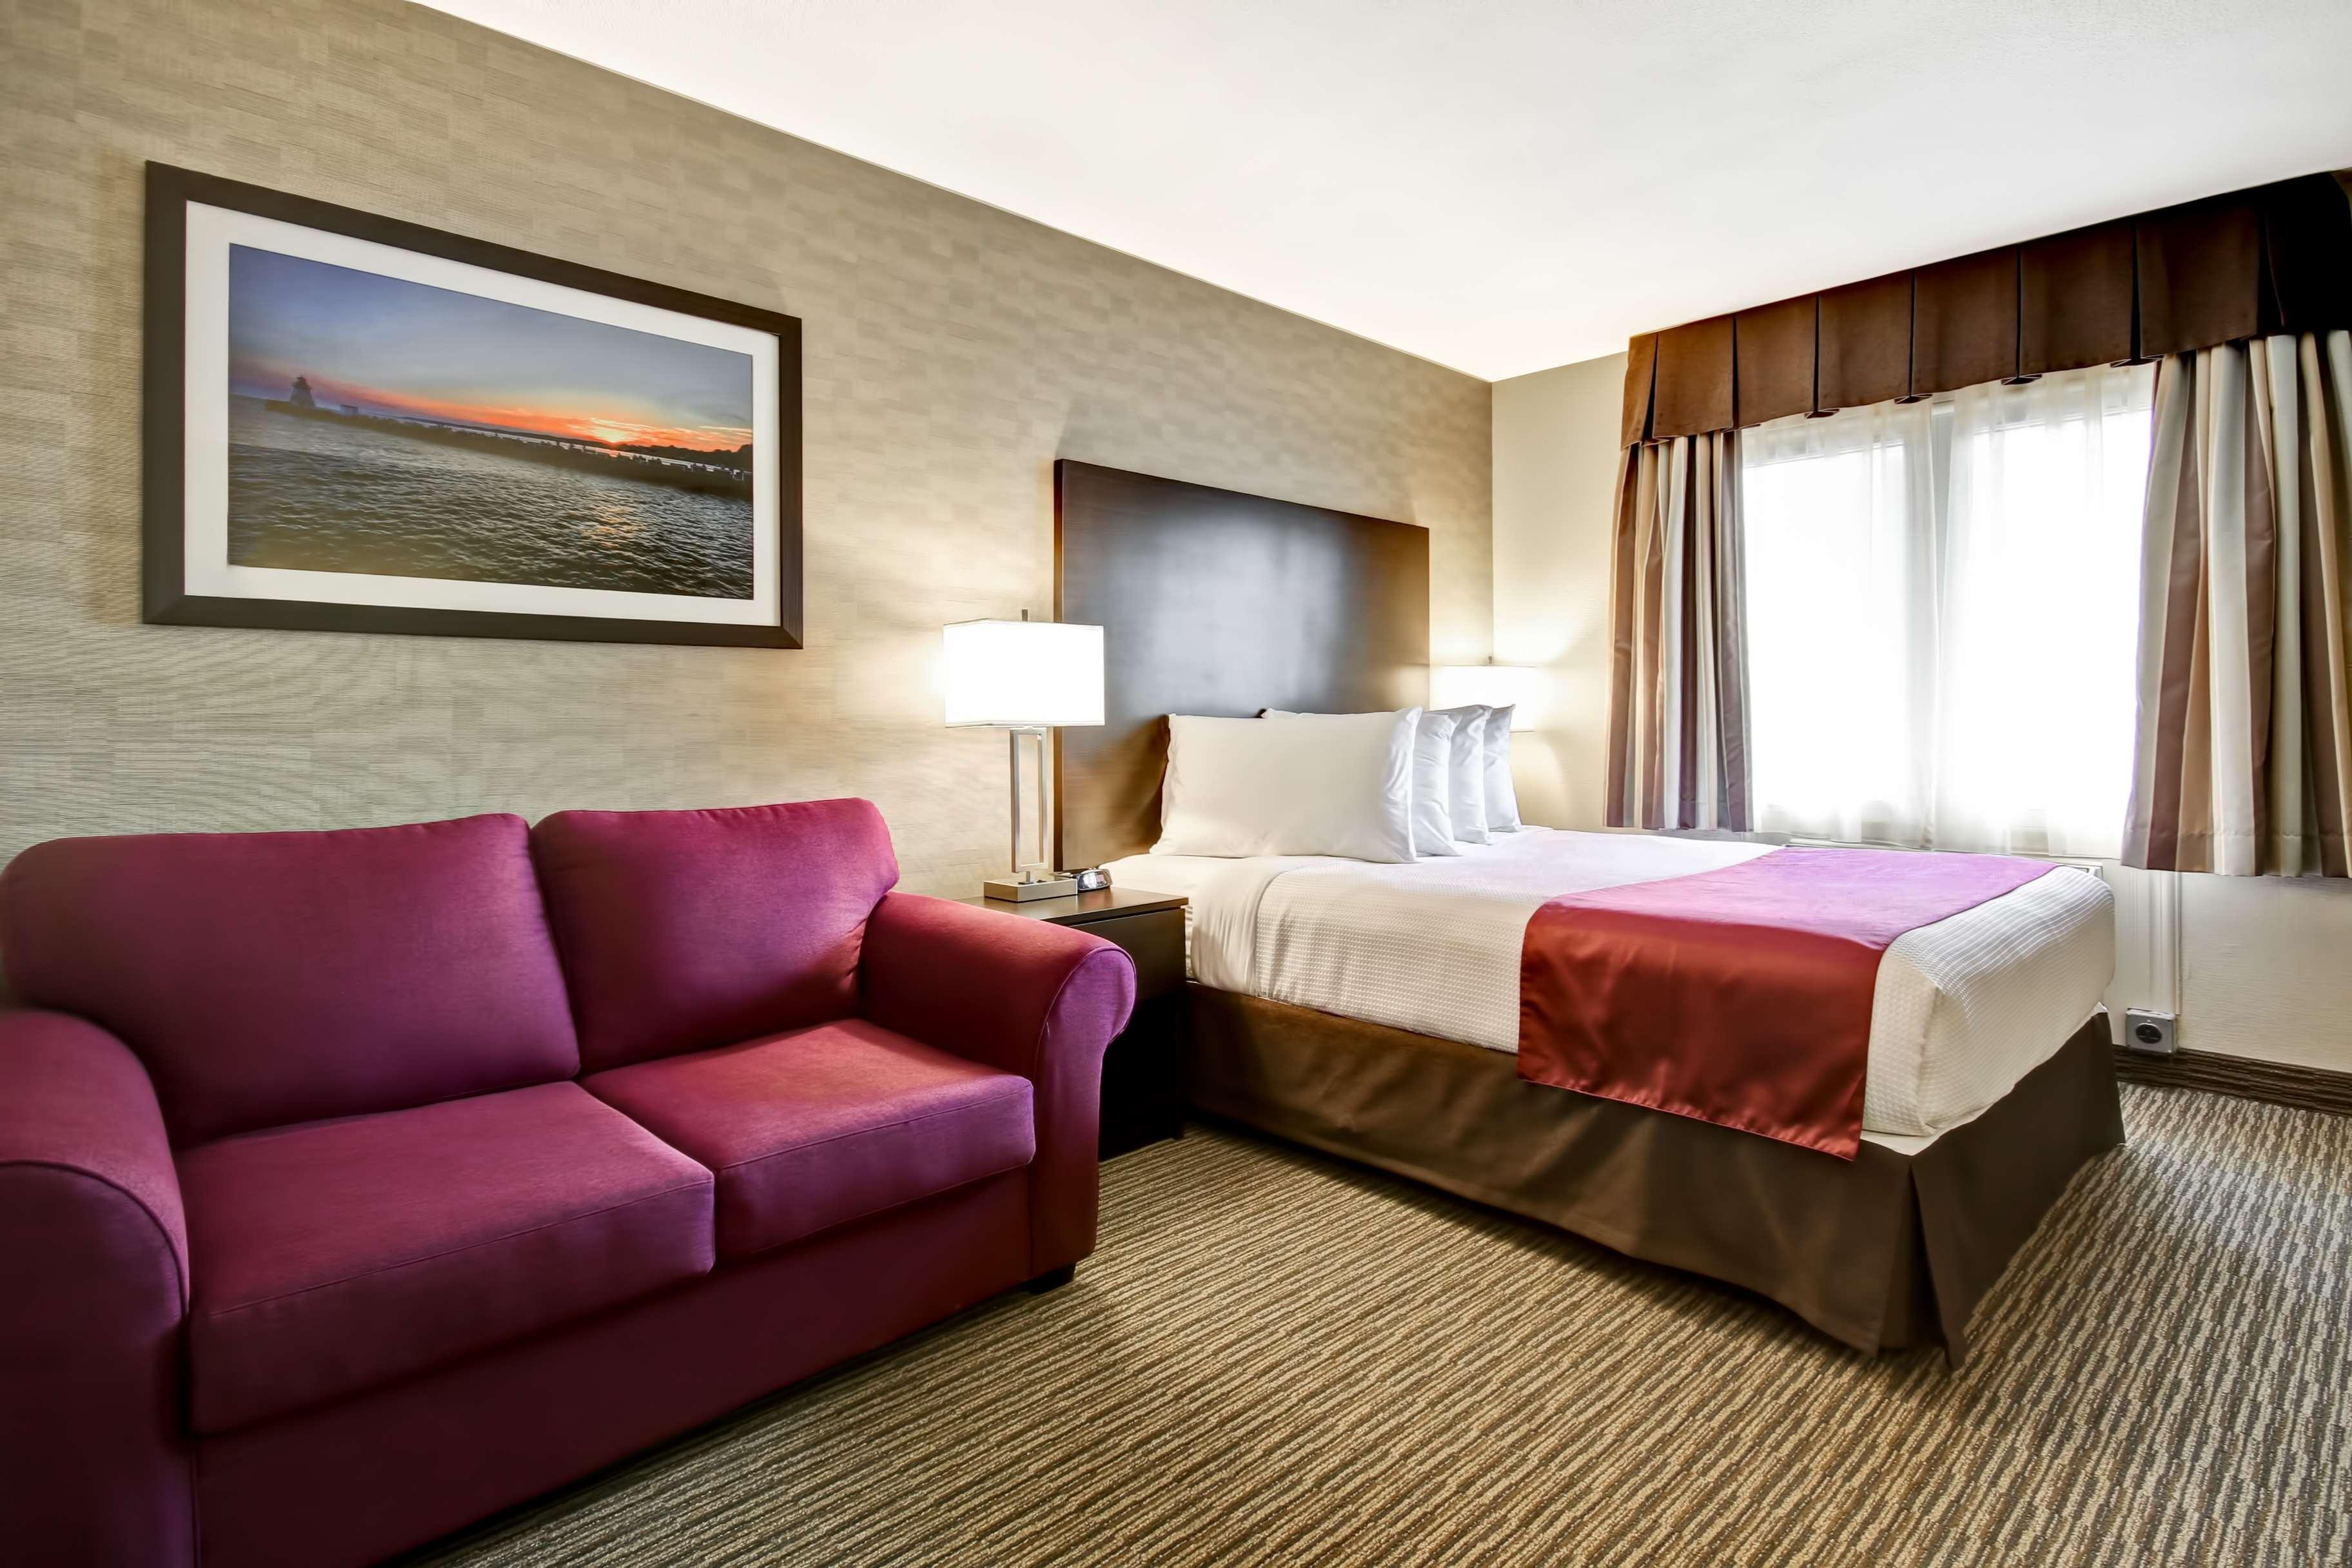 Best Western Little River Inn à Simcoe: One Queen Bed Guest Room